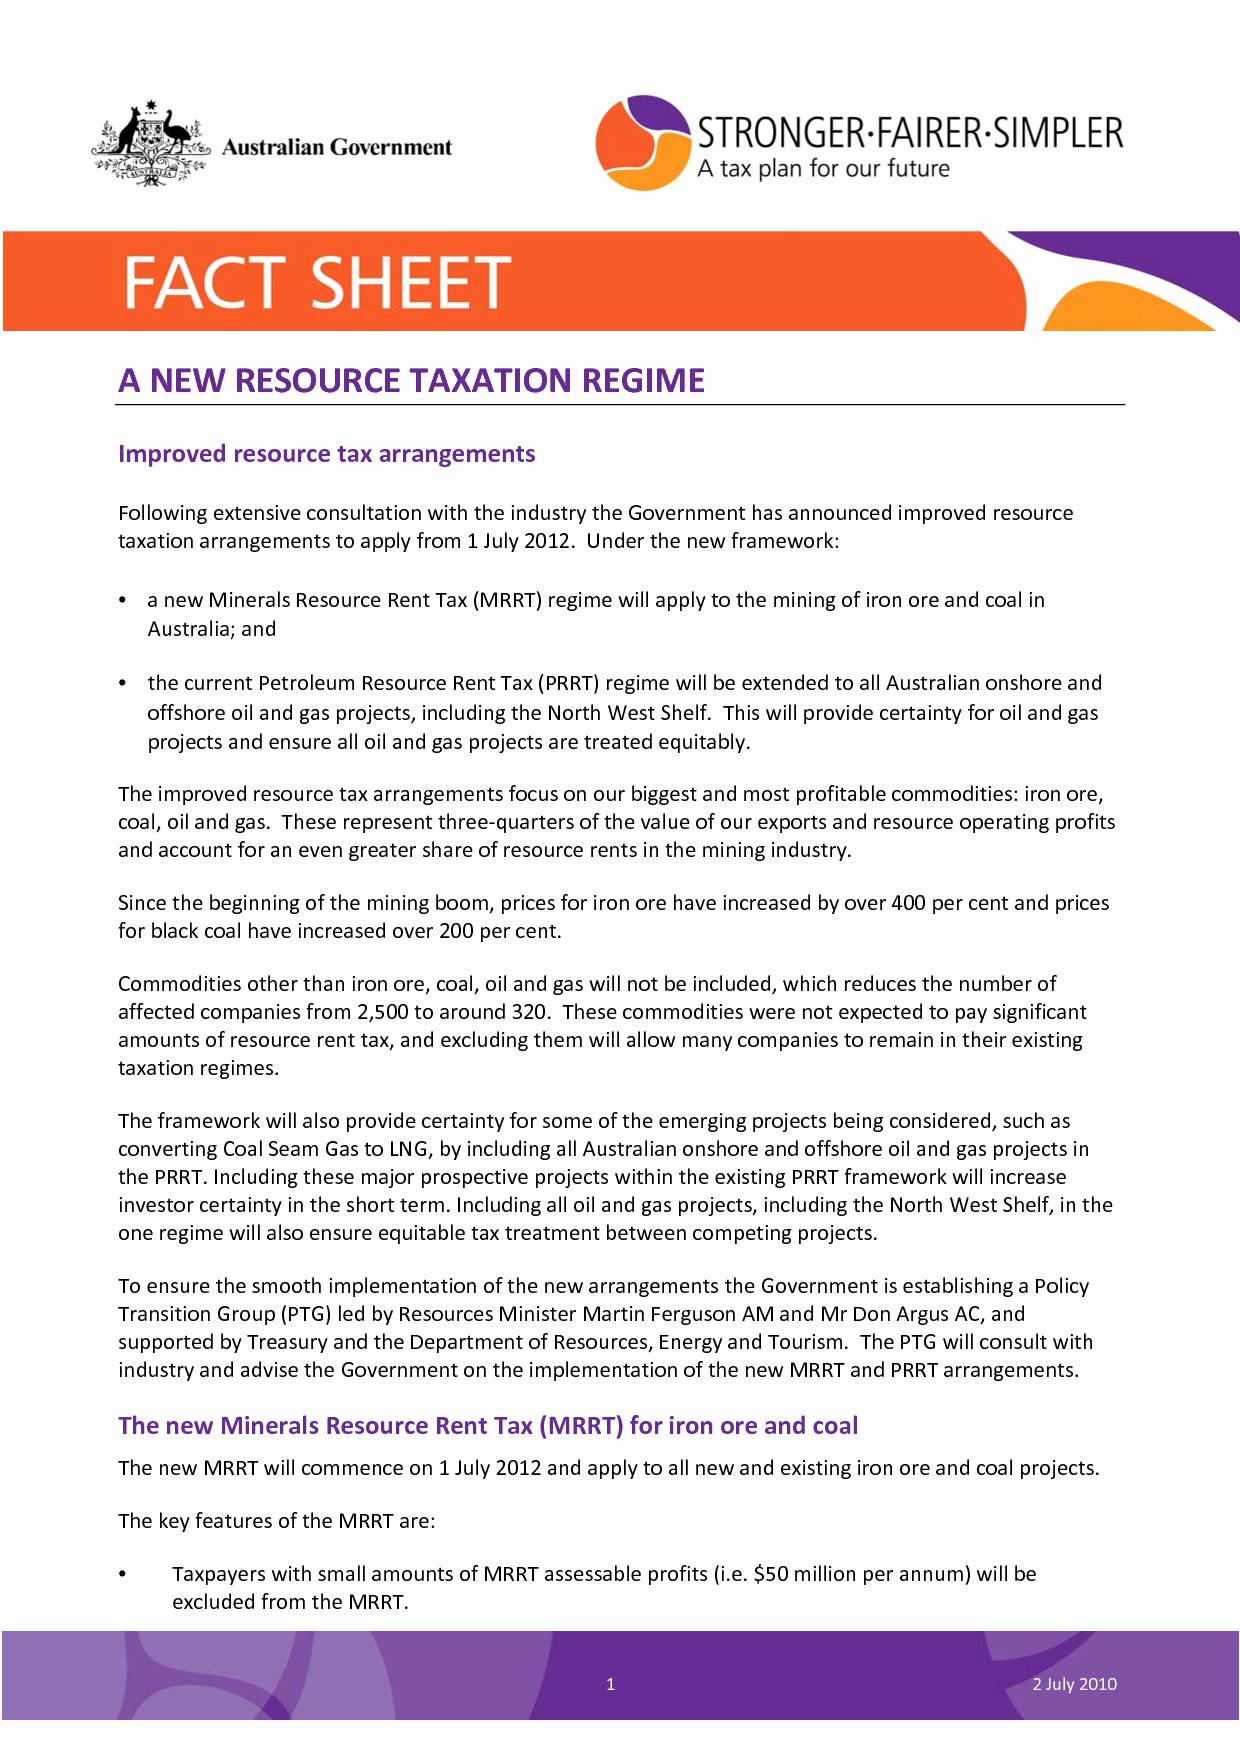 Fact Sheet Templates Microsoft Word Luxury Fact Sheet Template